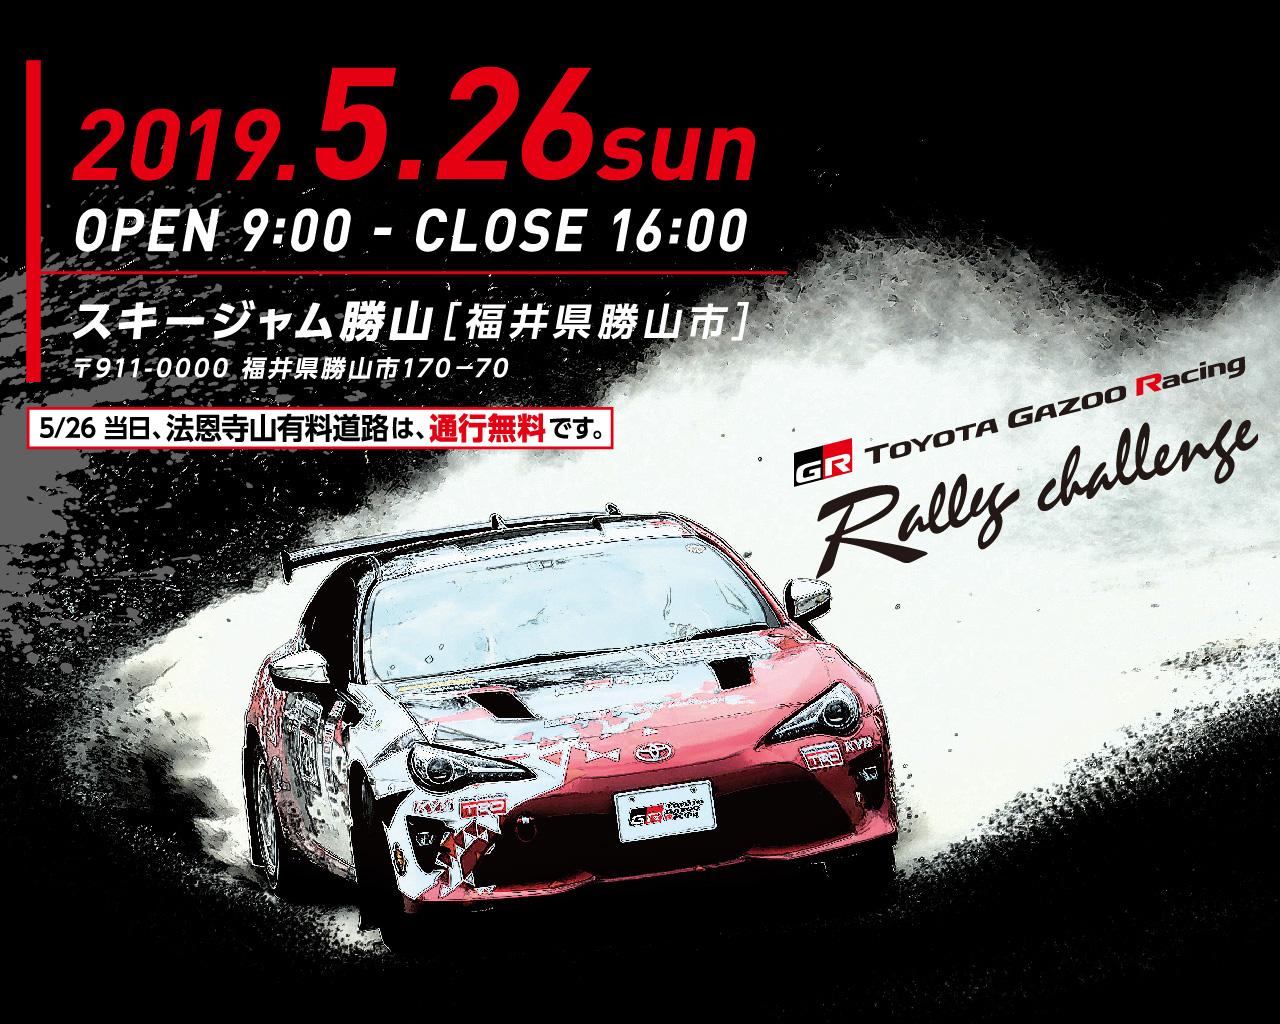 2019 TOYOTA GAZOO Racing ラリーチャレンジ in 恐竜勝山